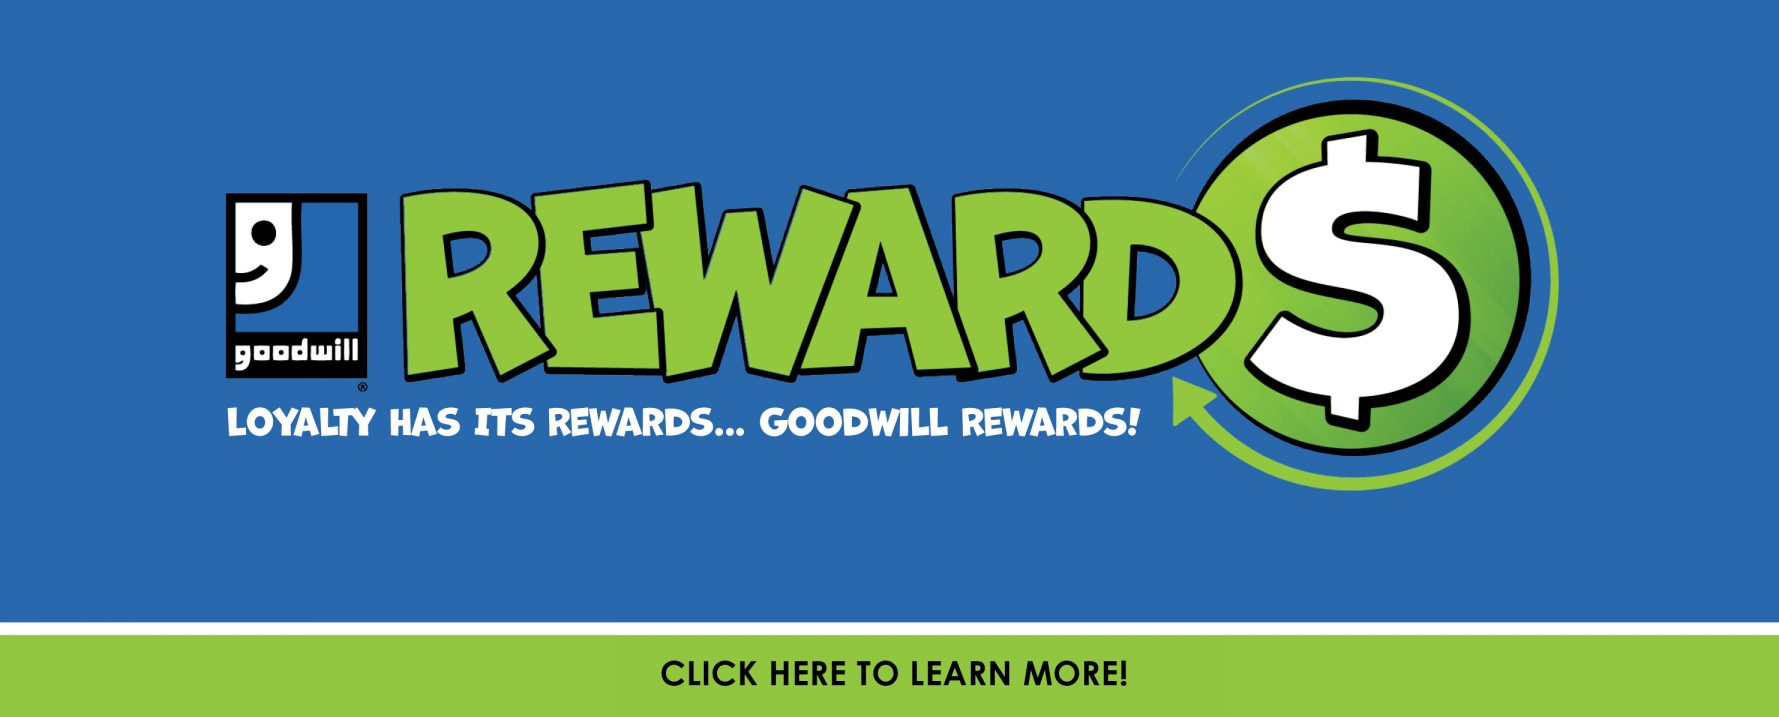 Goodwill Rewards